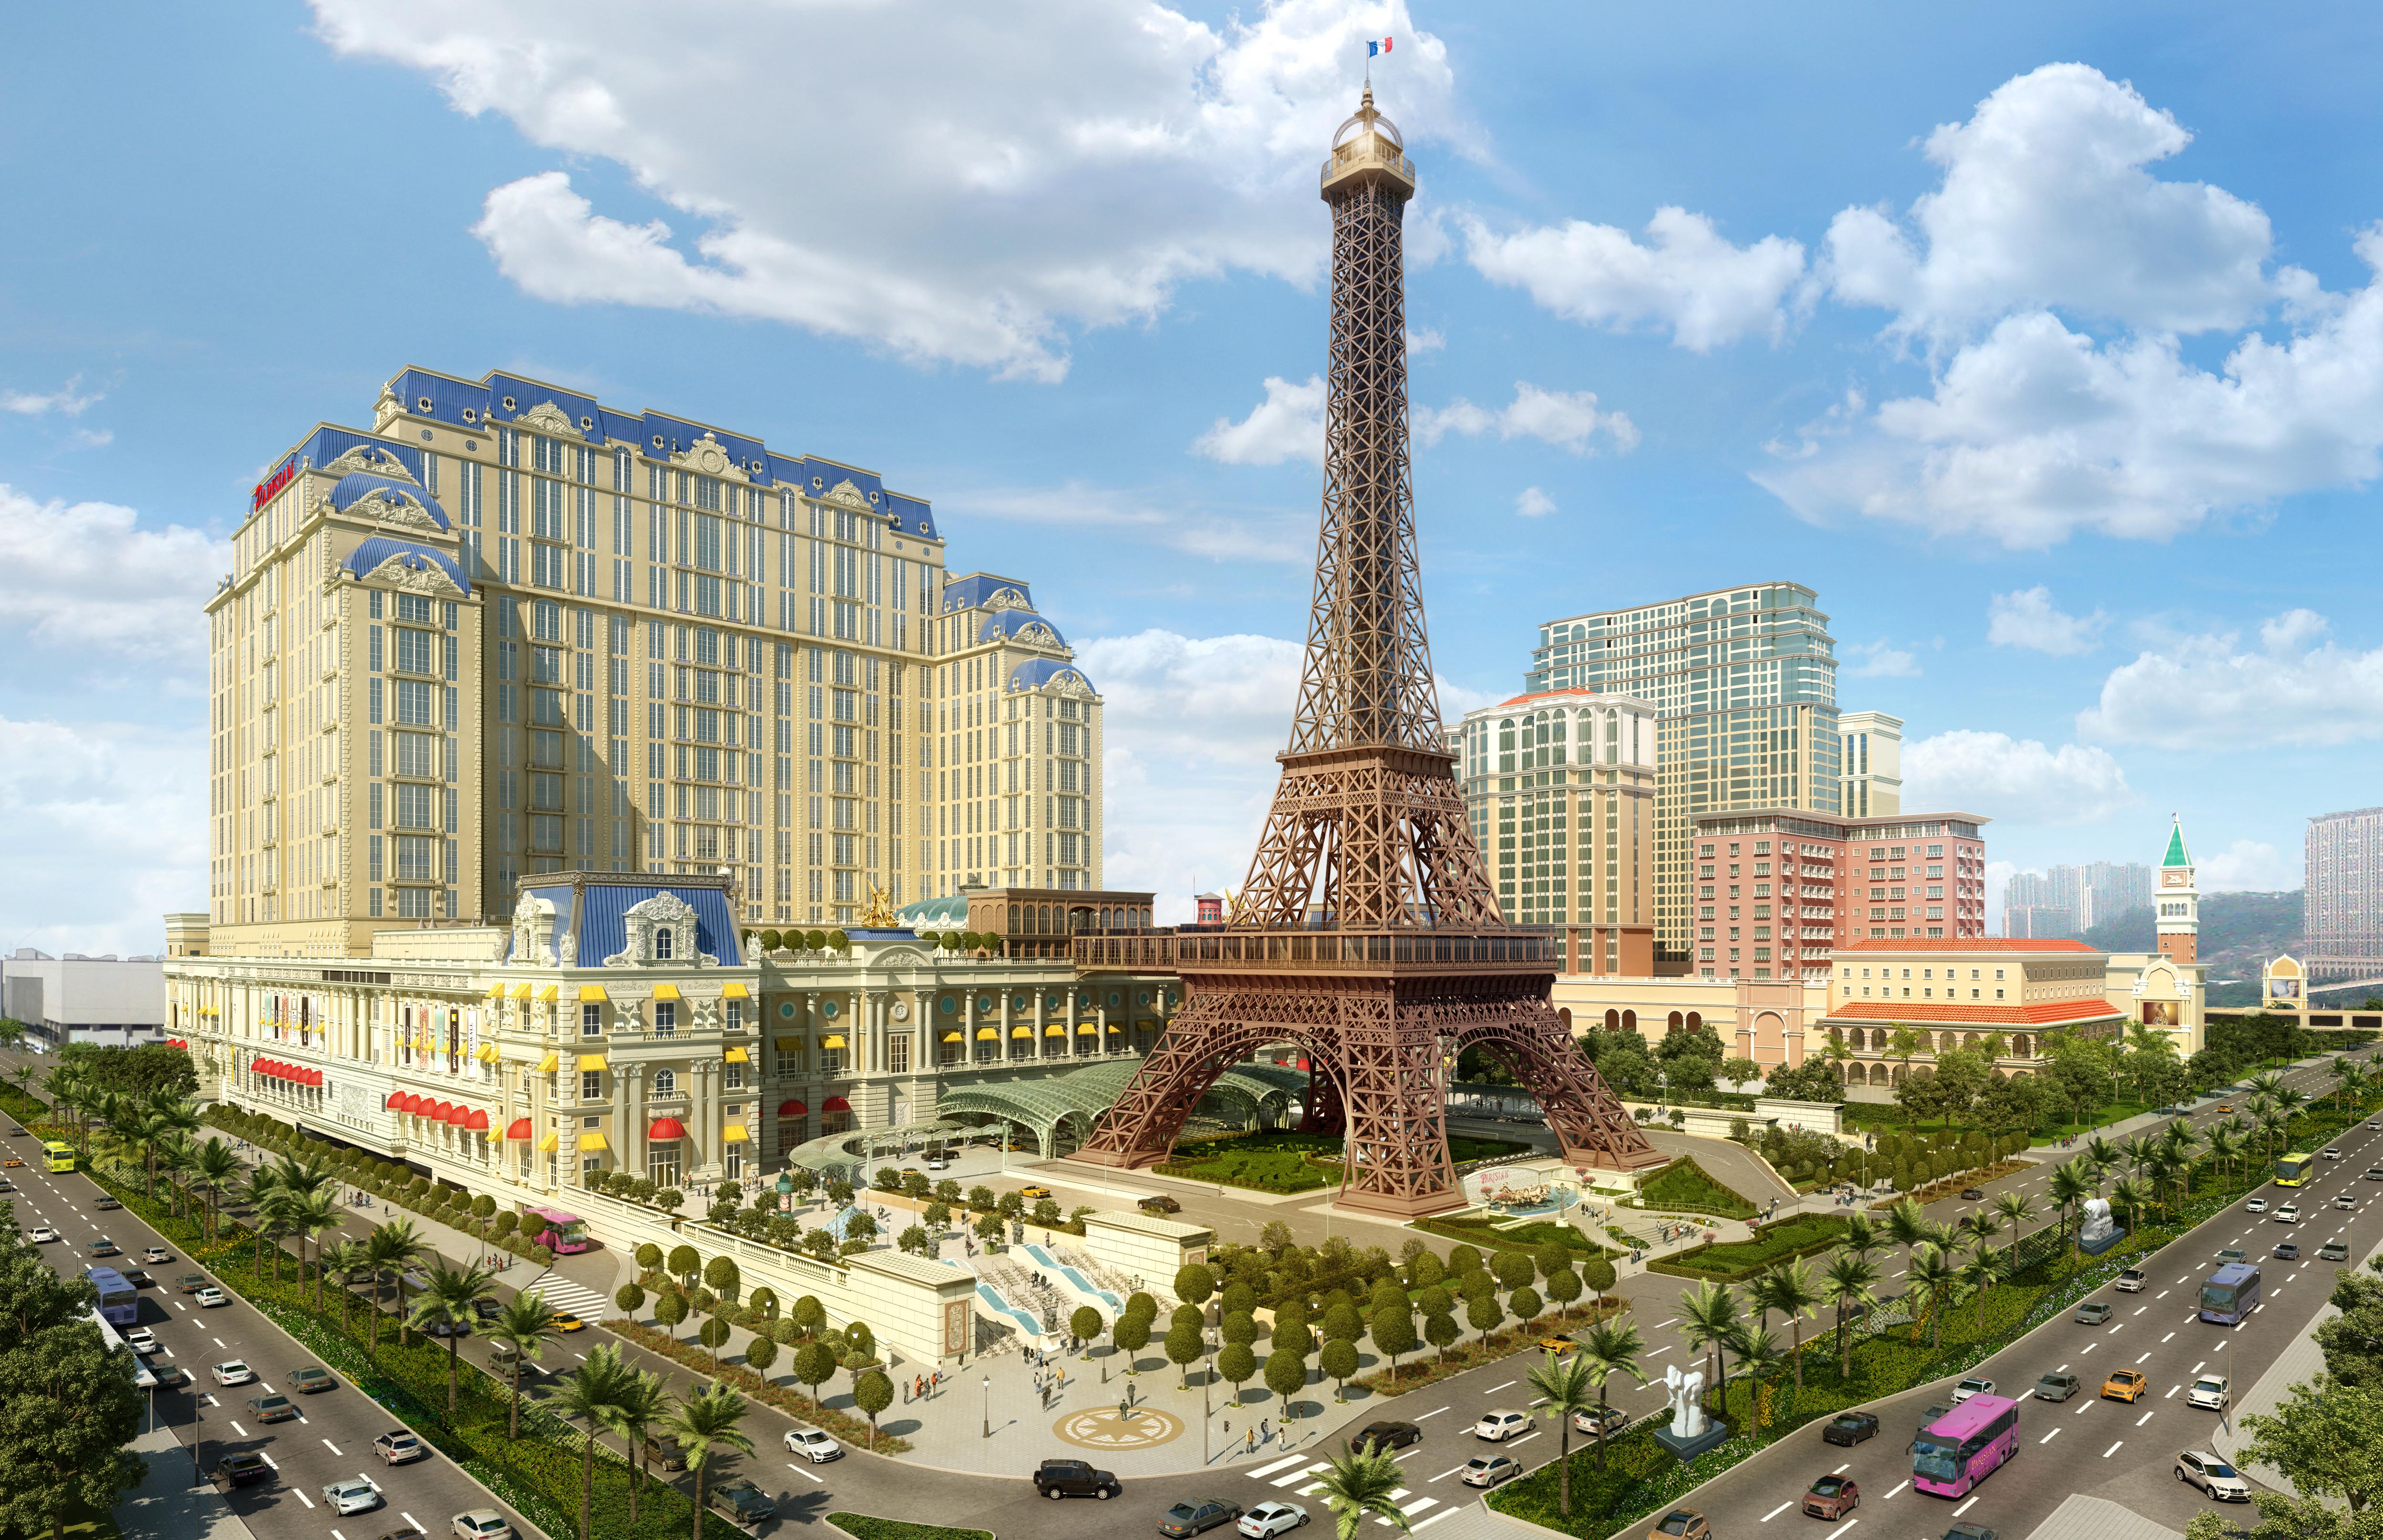 Rendering of The Parisian Macau.